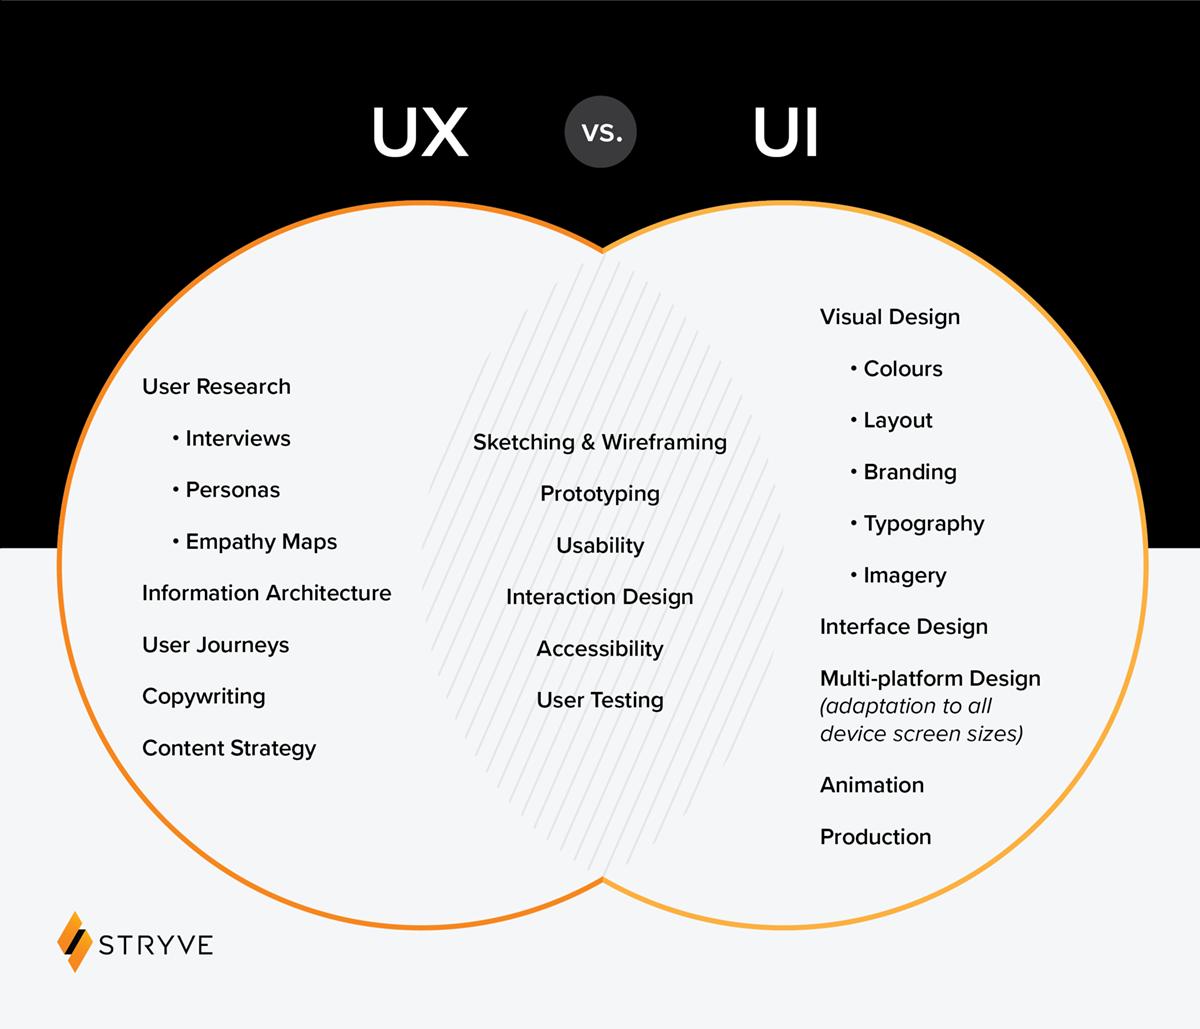 Venn diagram comparing UX vs. UI